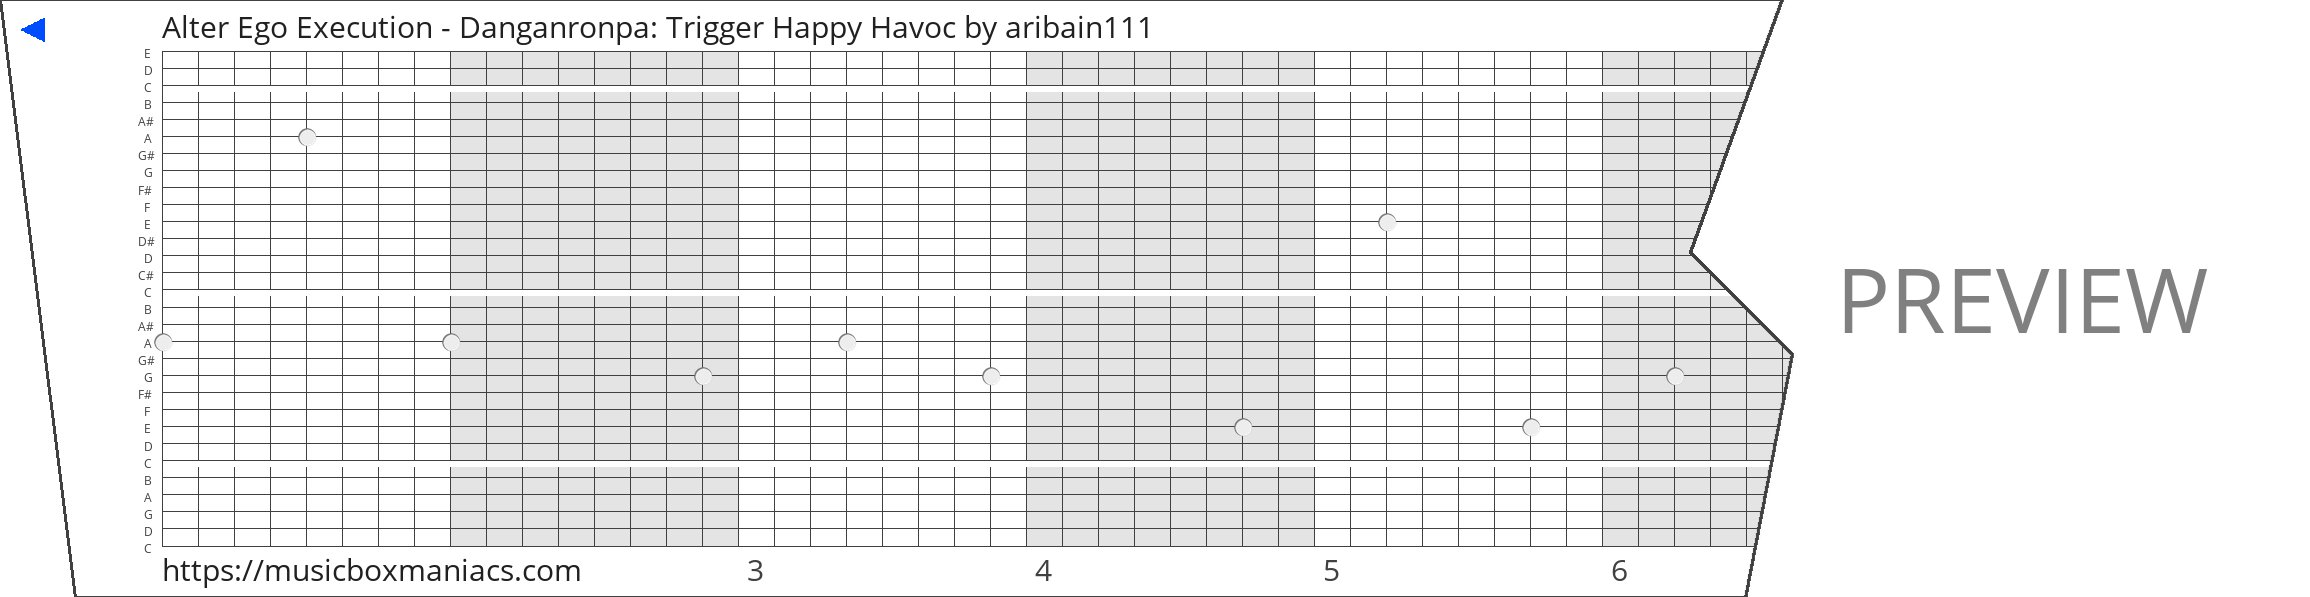 Alter Ego Execution - Danganronpa: Trigger Happy Havoc 30 note music box paper strip